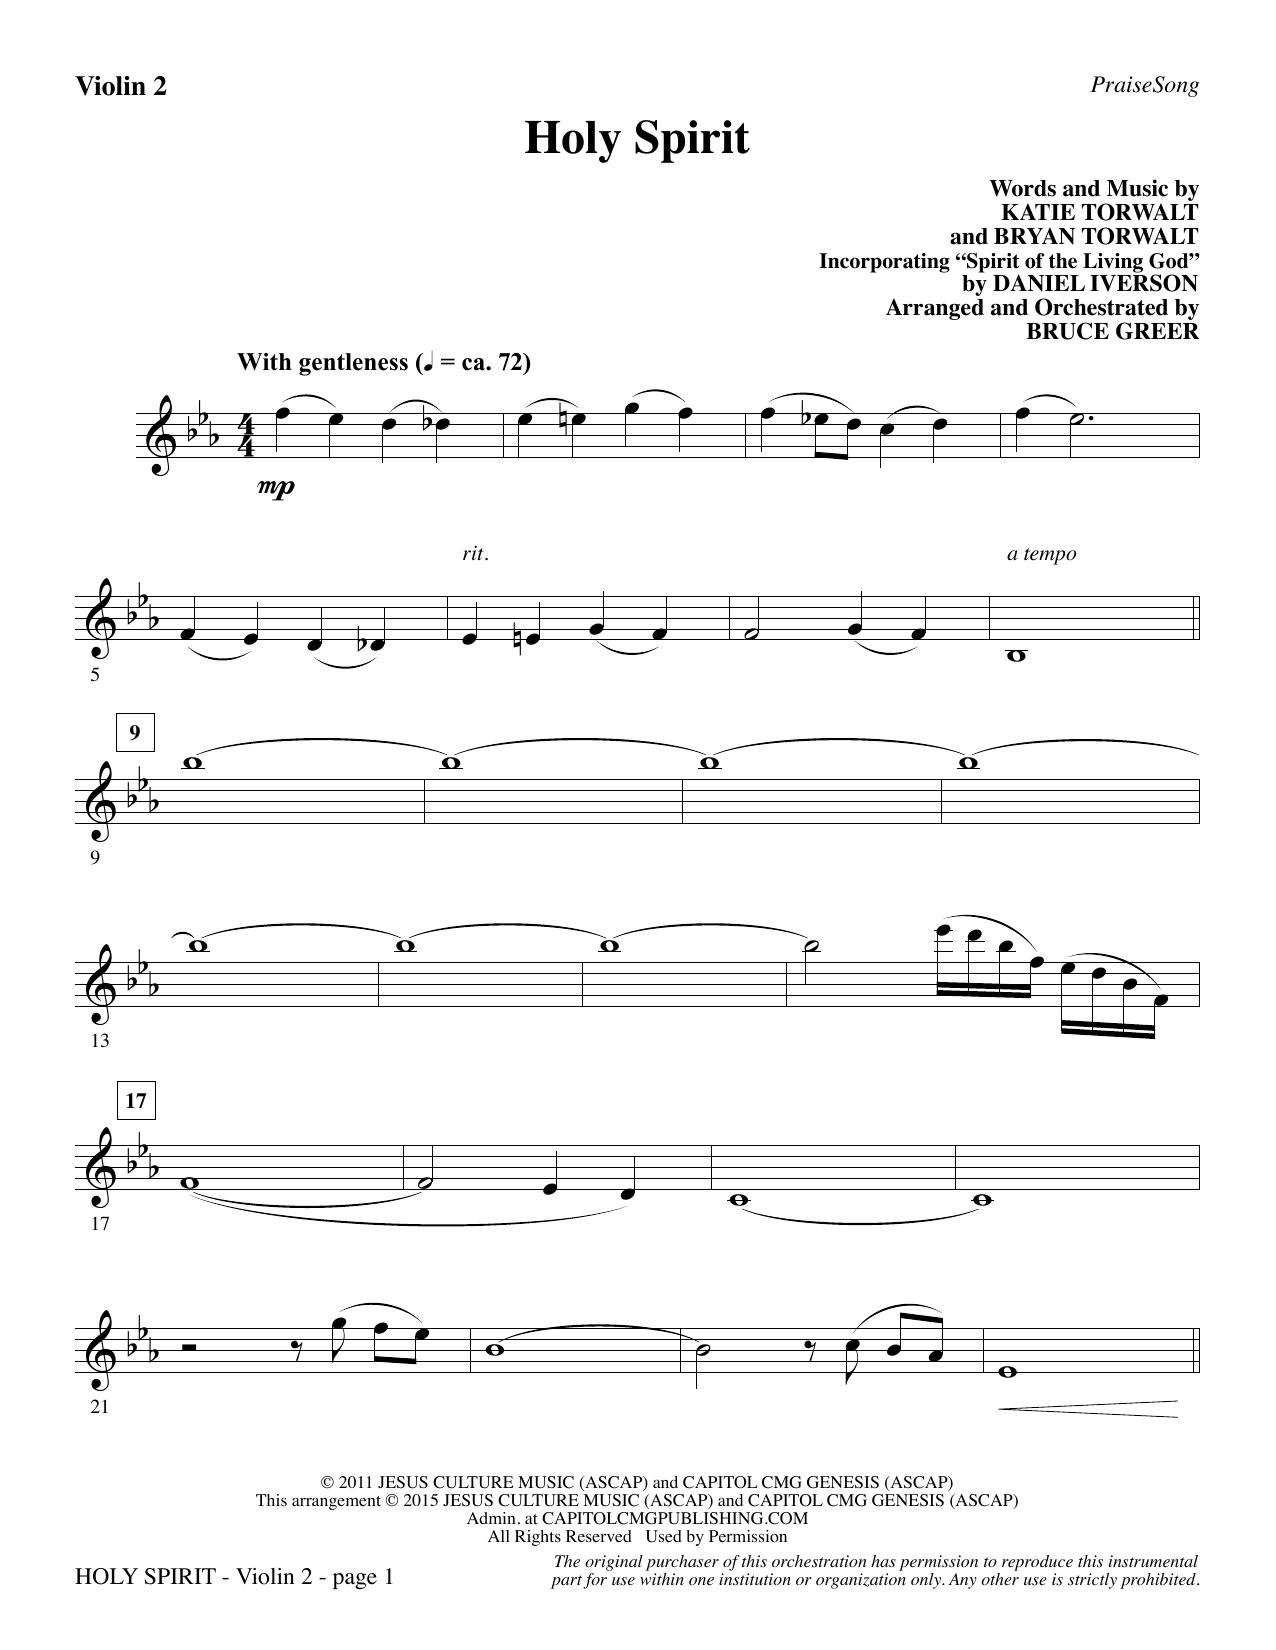 Holy Spirit - Violin 2 sheet music